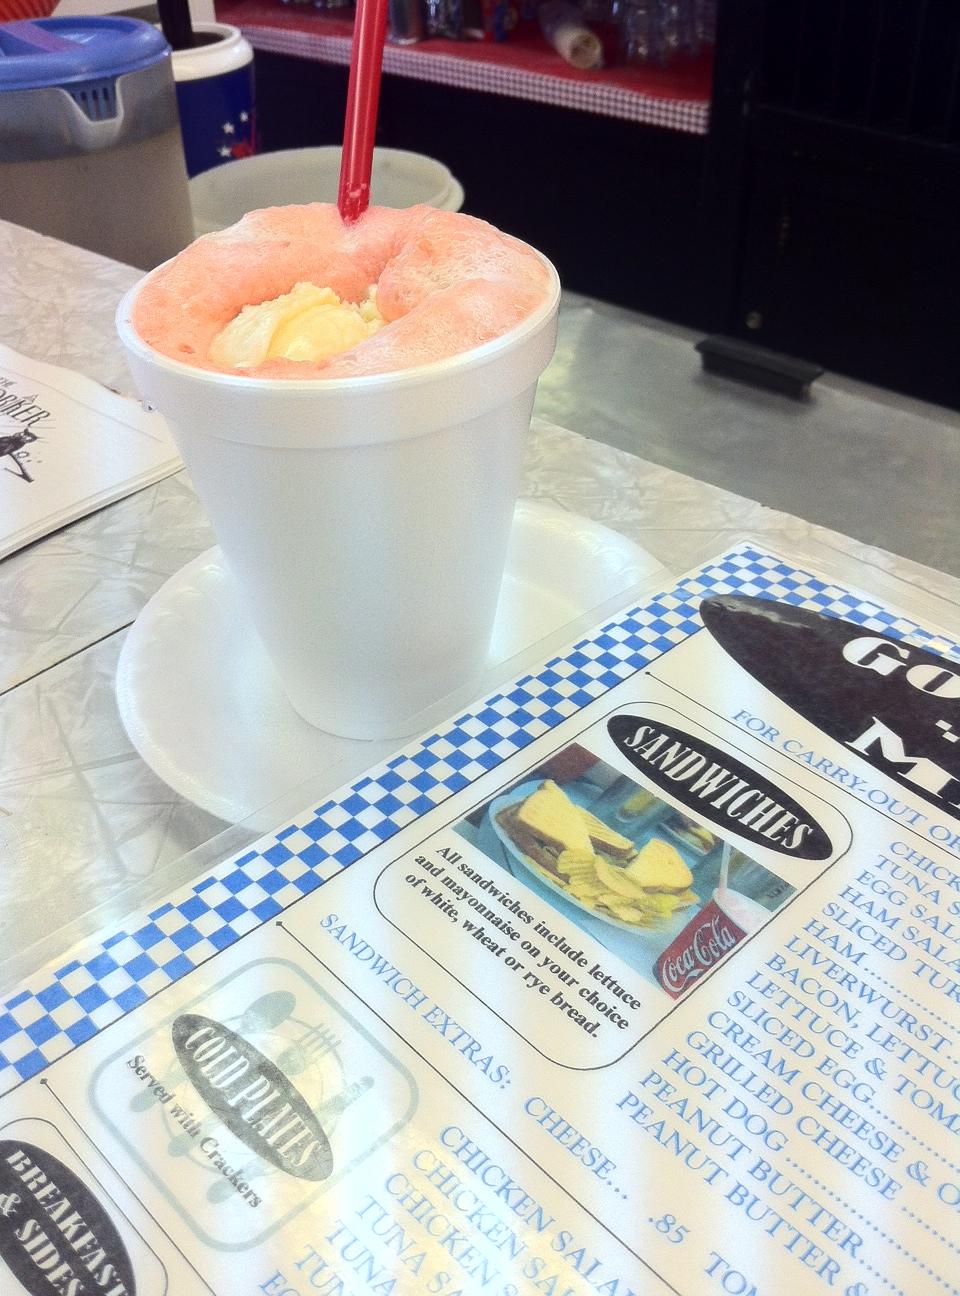 A strawberry soda (strawberry syrup, soda water and vanilla ice cream) from Goolrick's